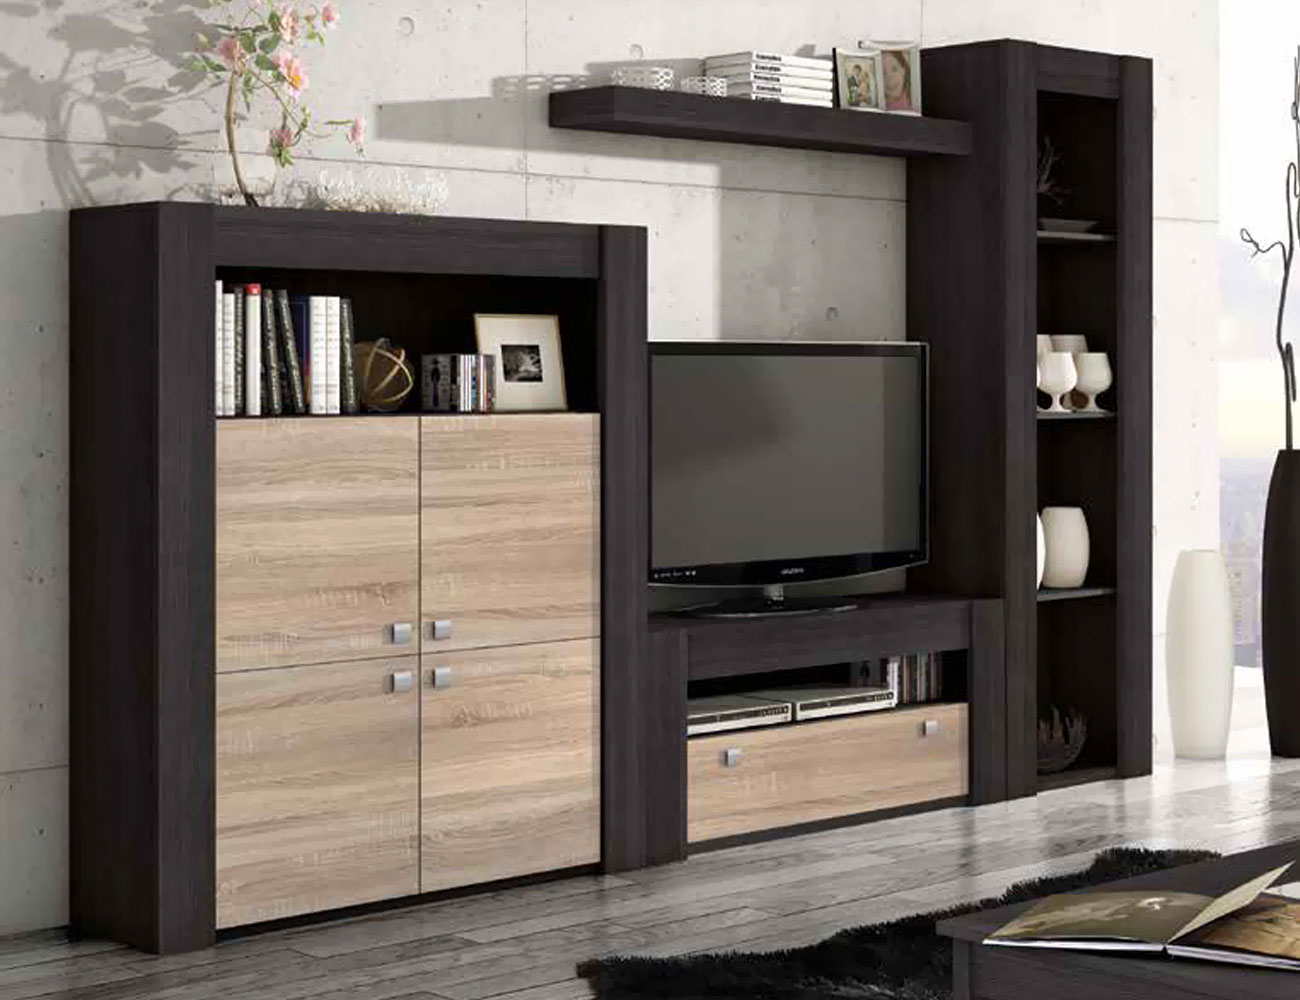 Mueble salon moderno comp03c1